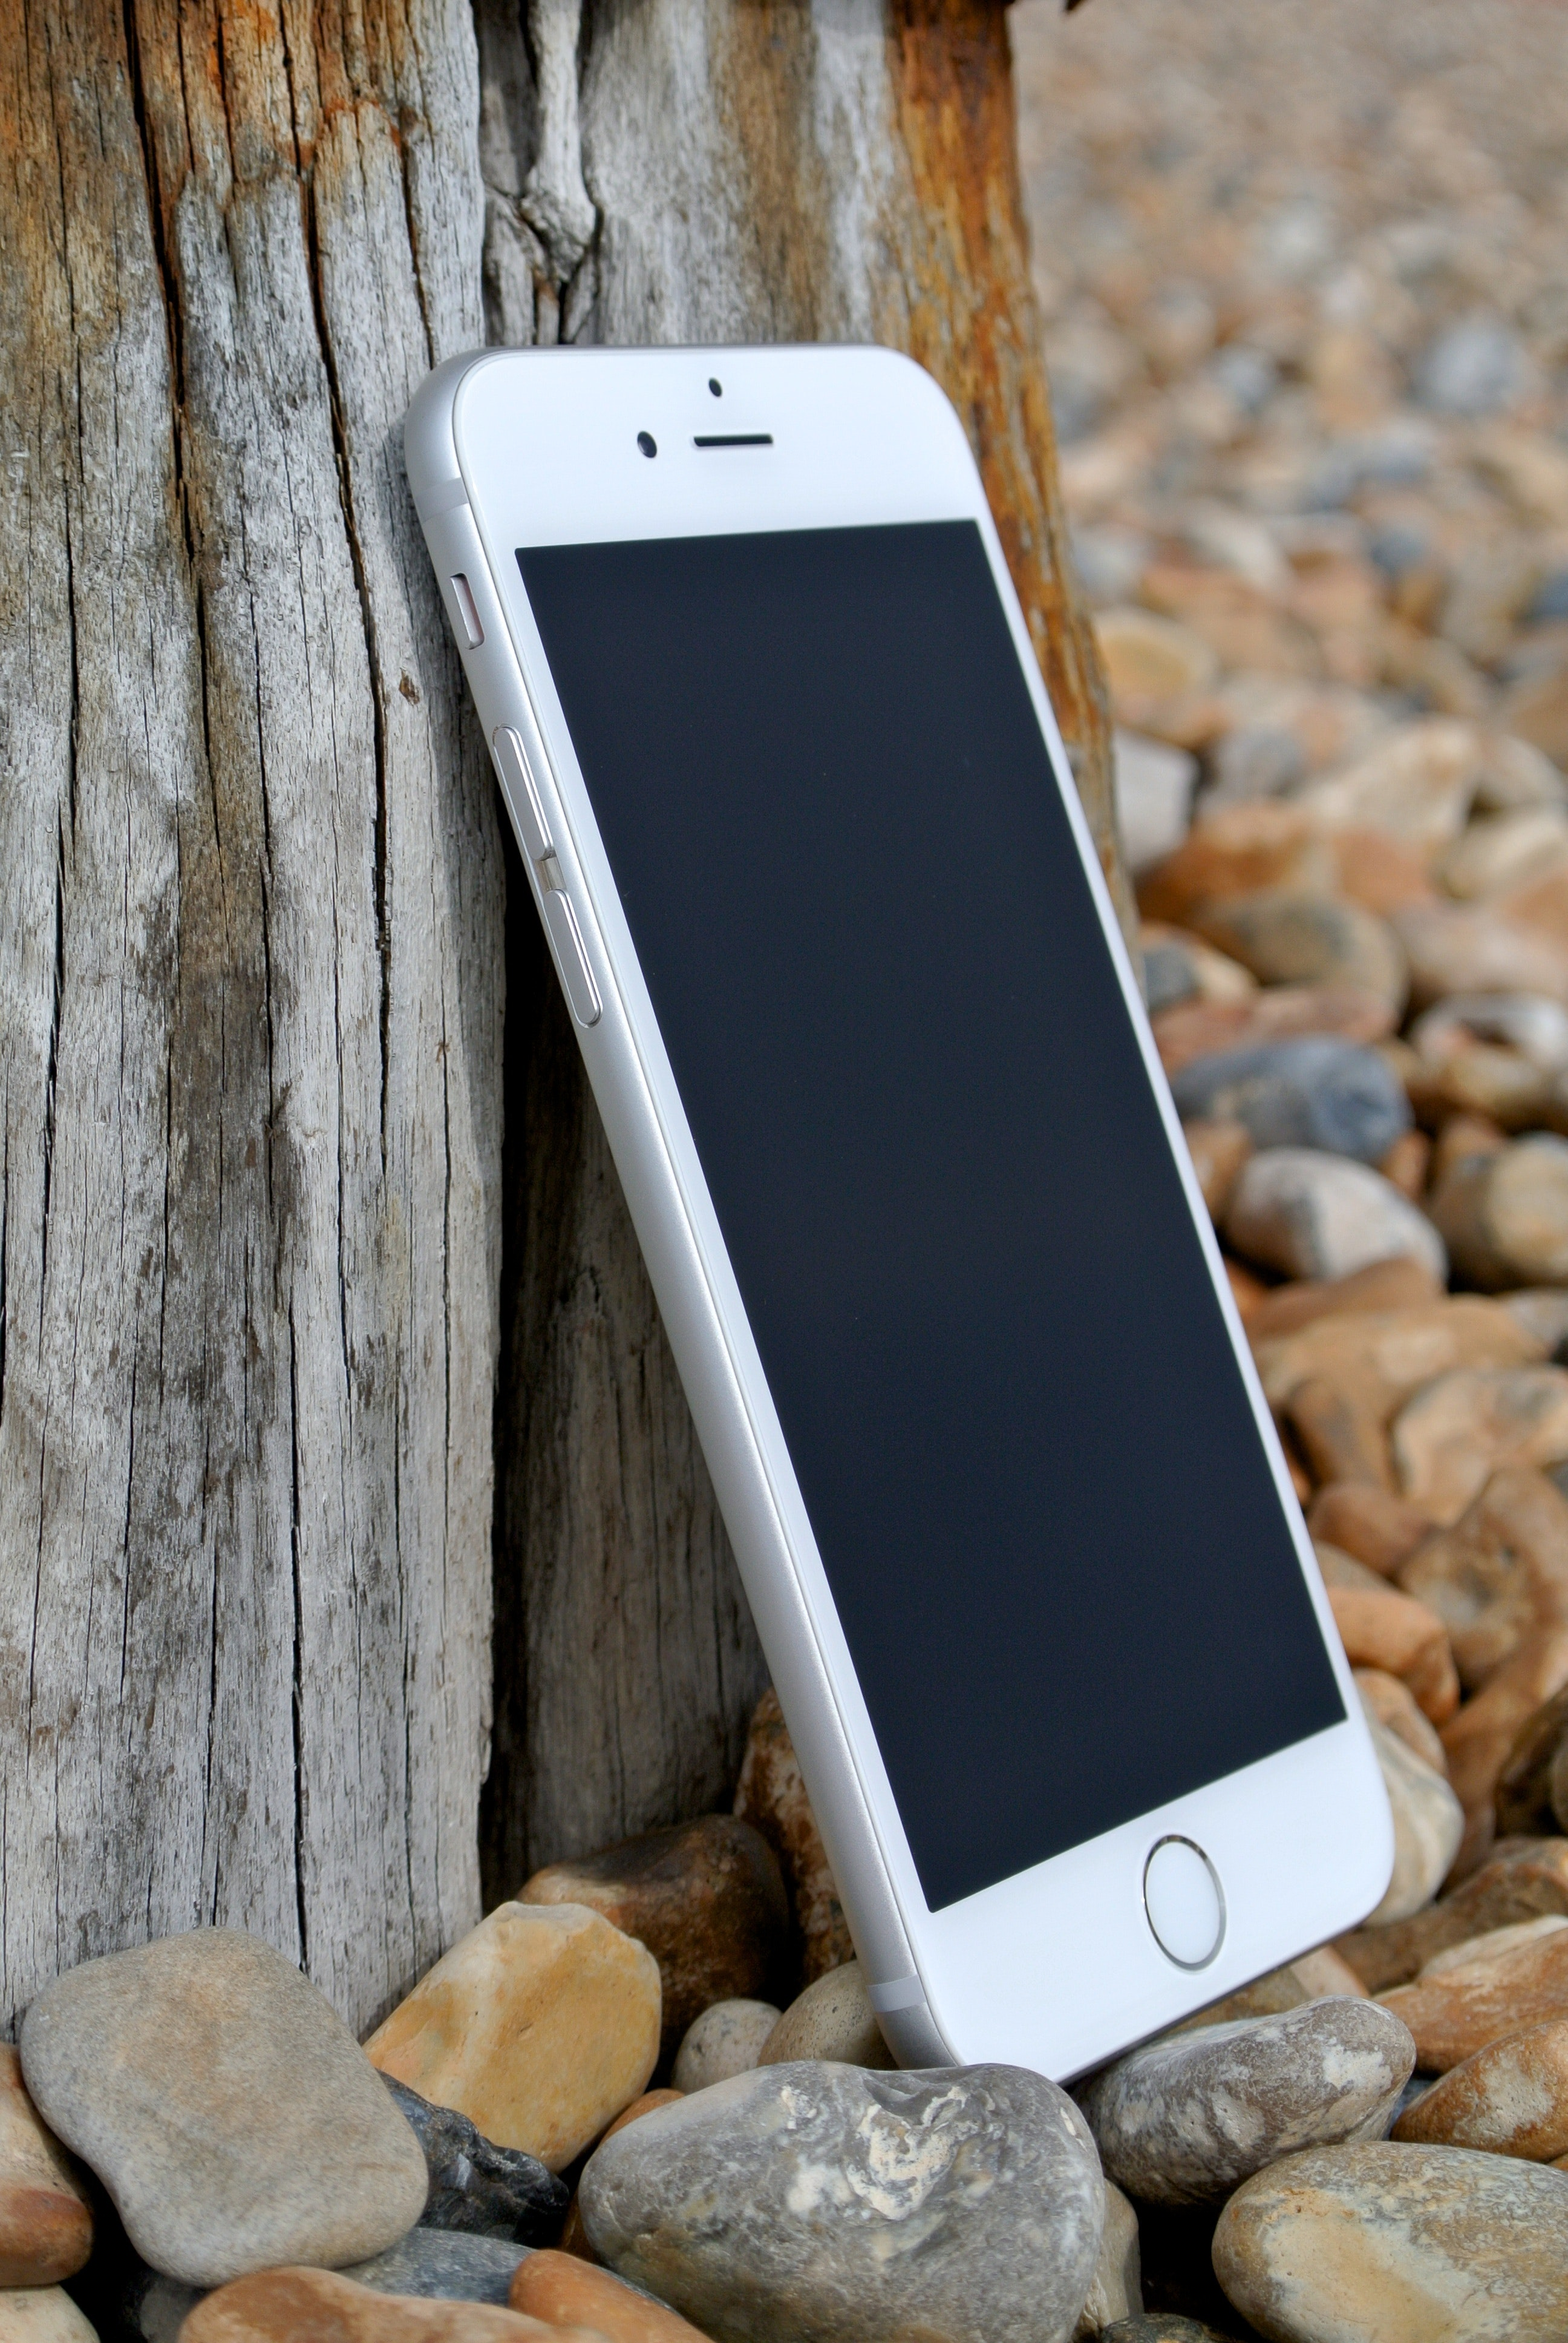 smartphone on rocks beside tree roots